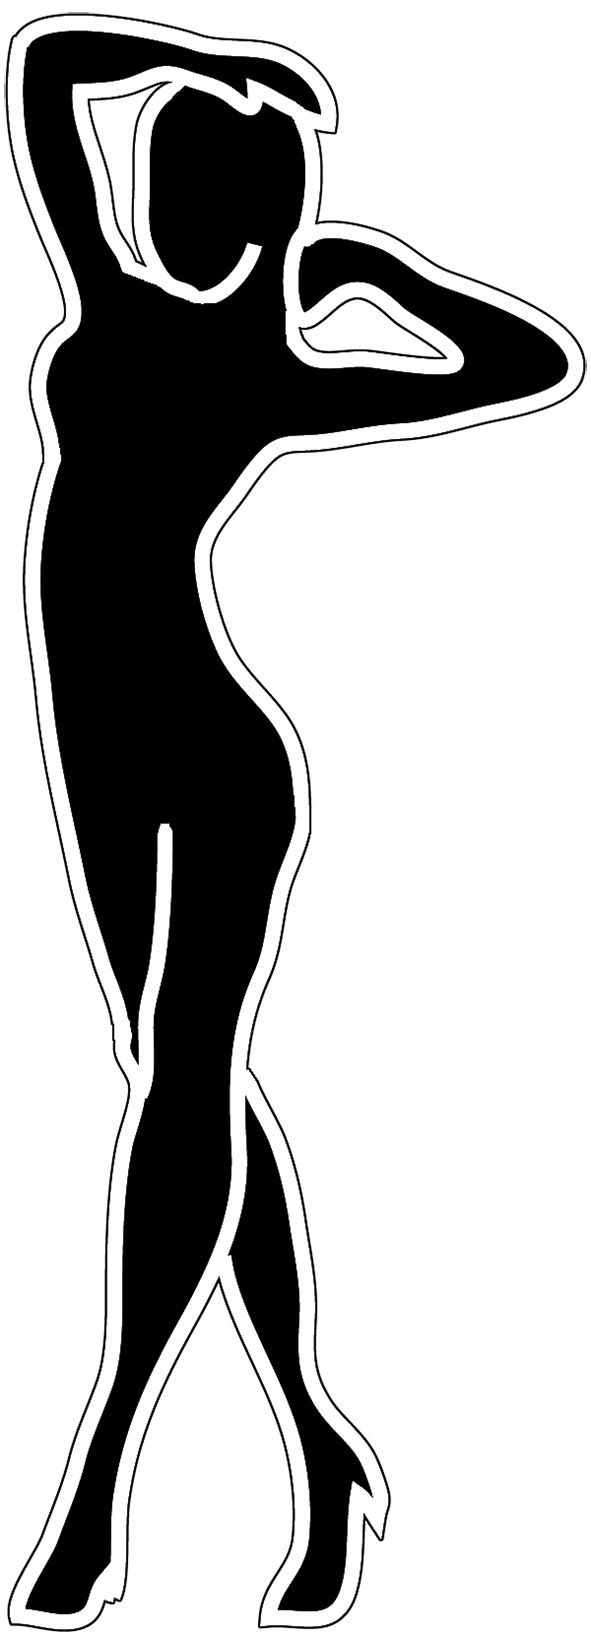 Black And White Female Silhouette.